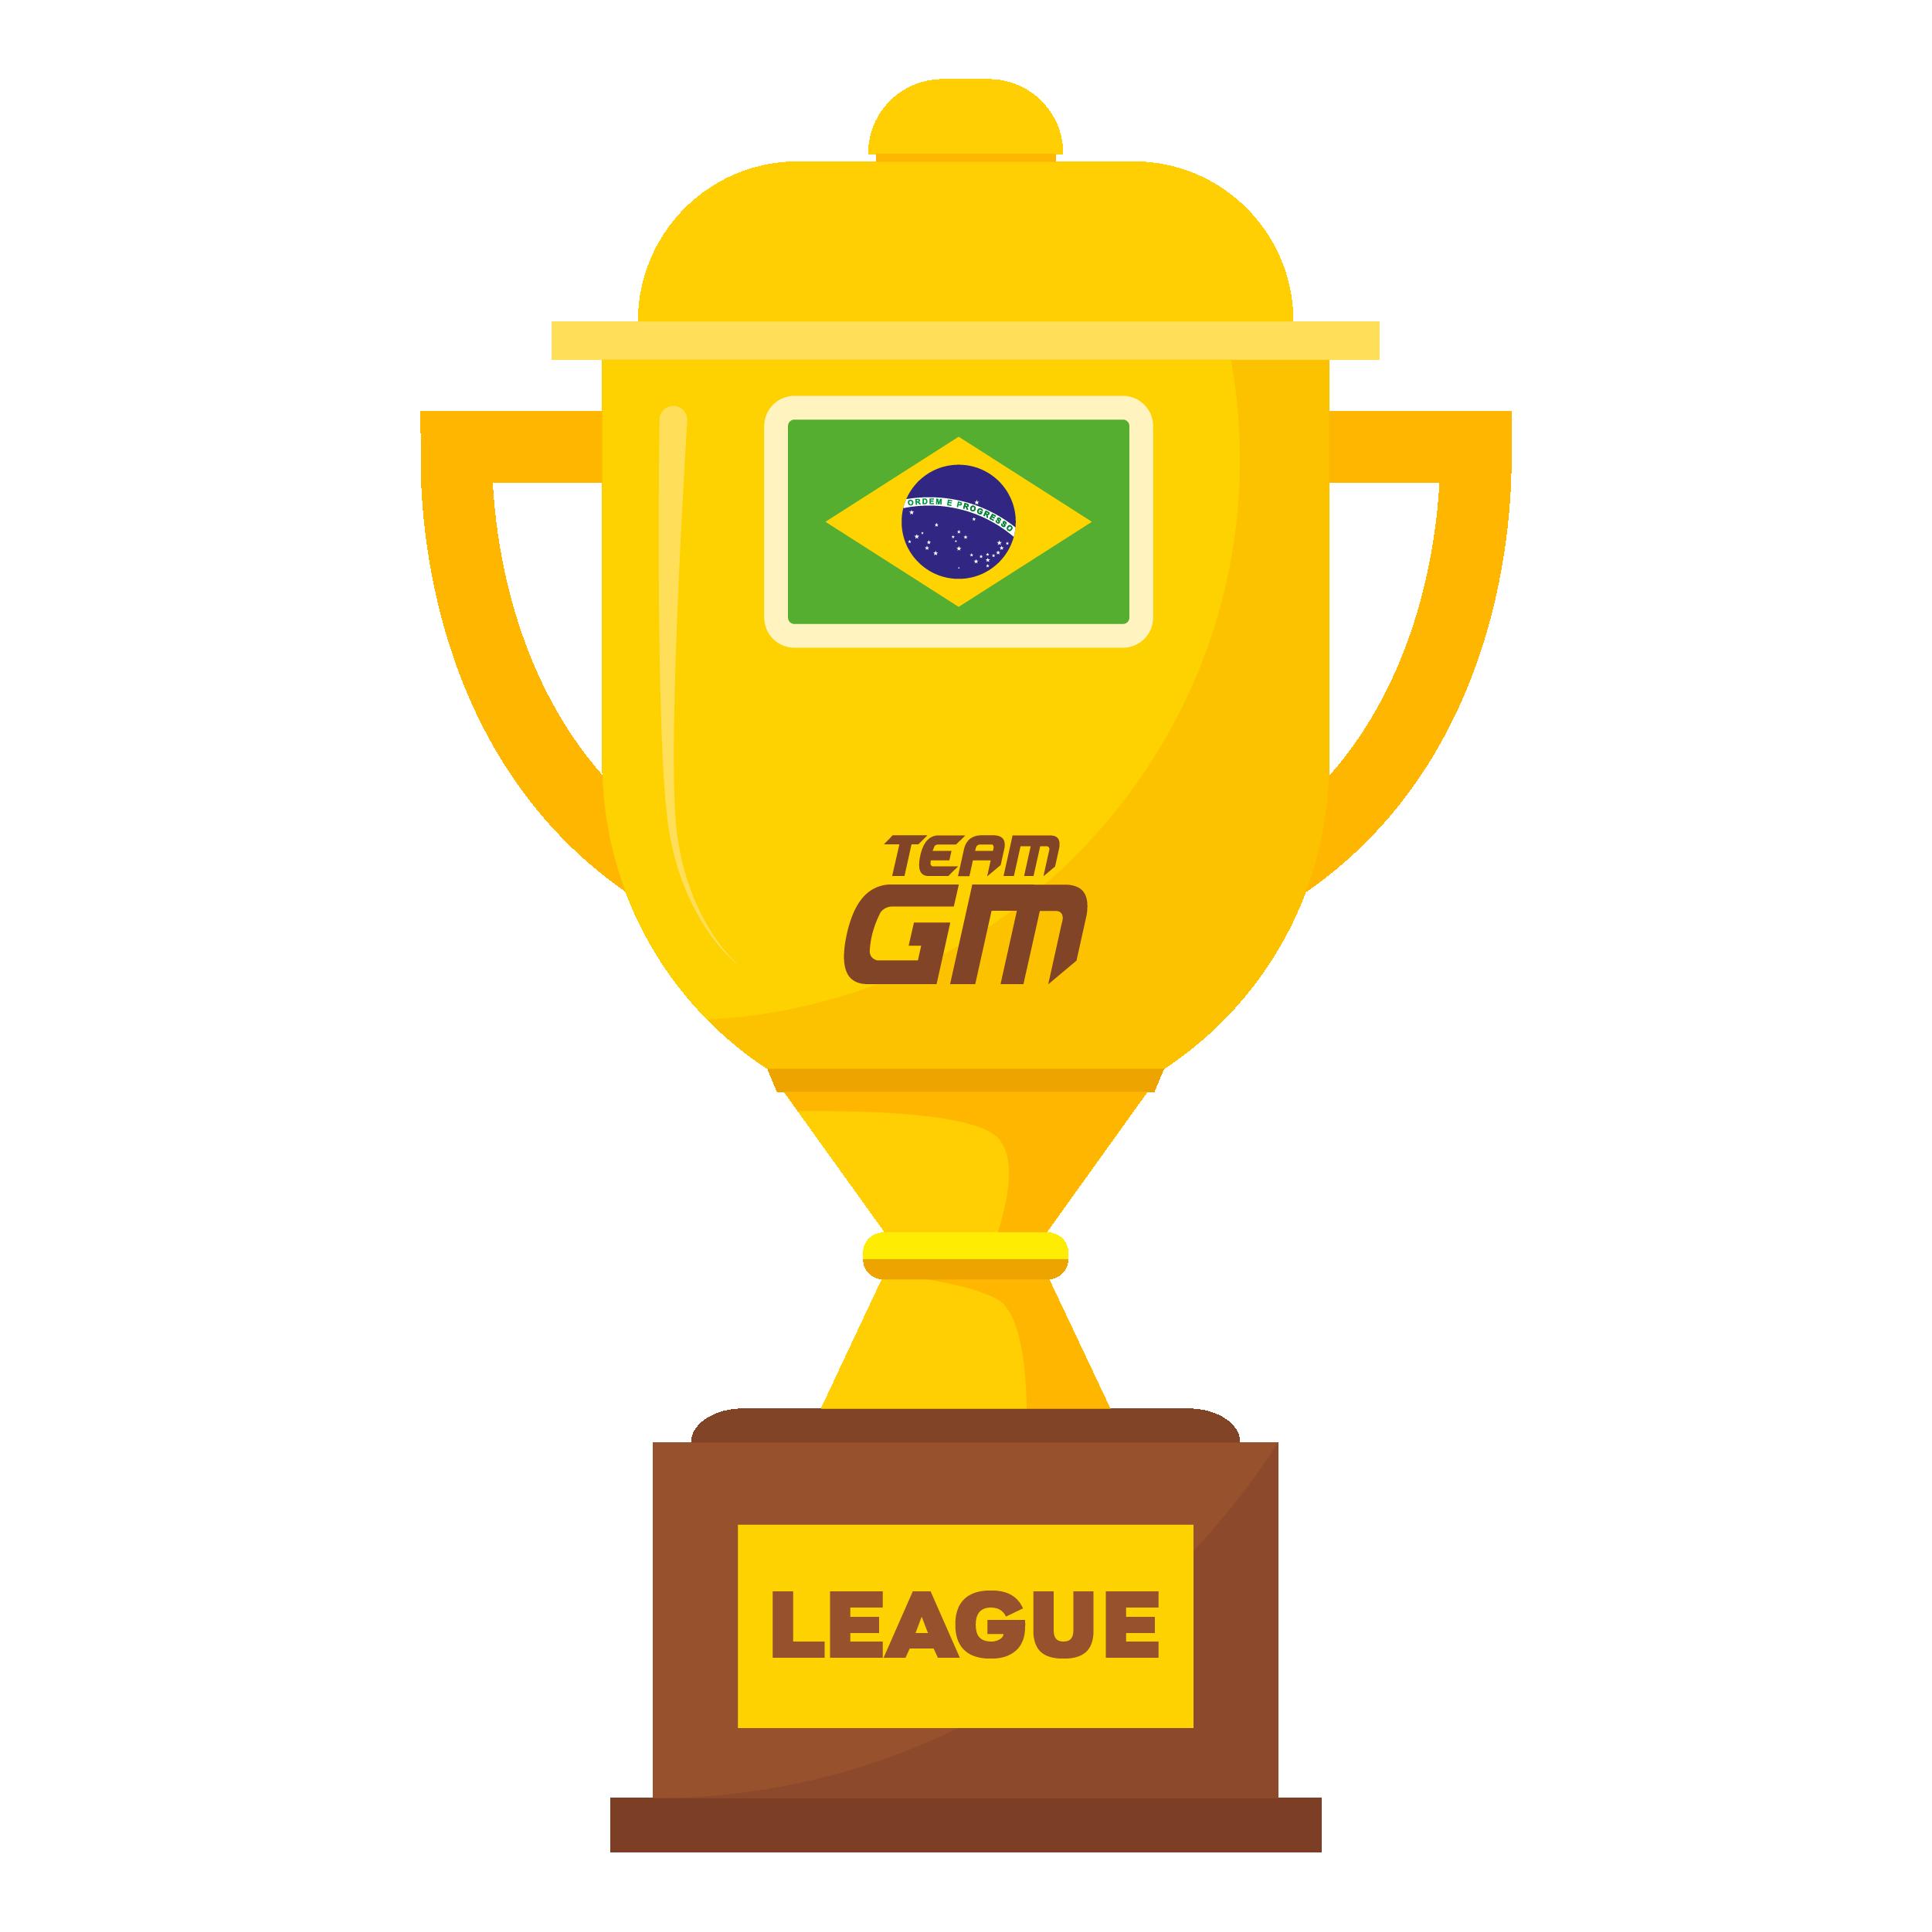 2ND - BRAZILIAN SUPER LEAGUE (C SERIE)